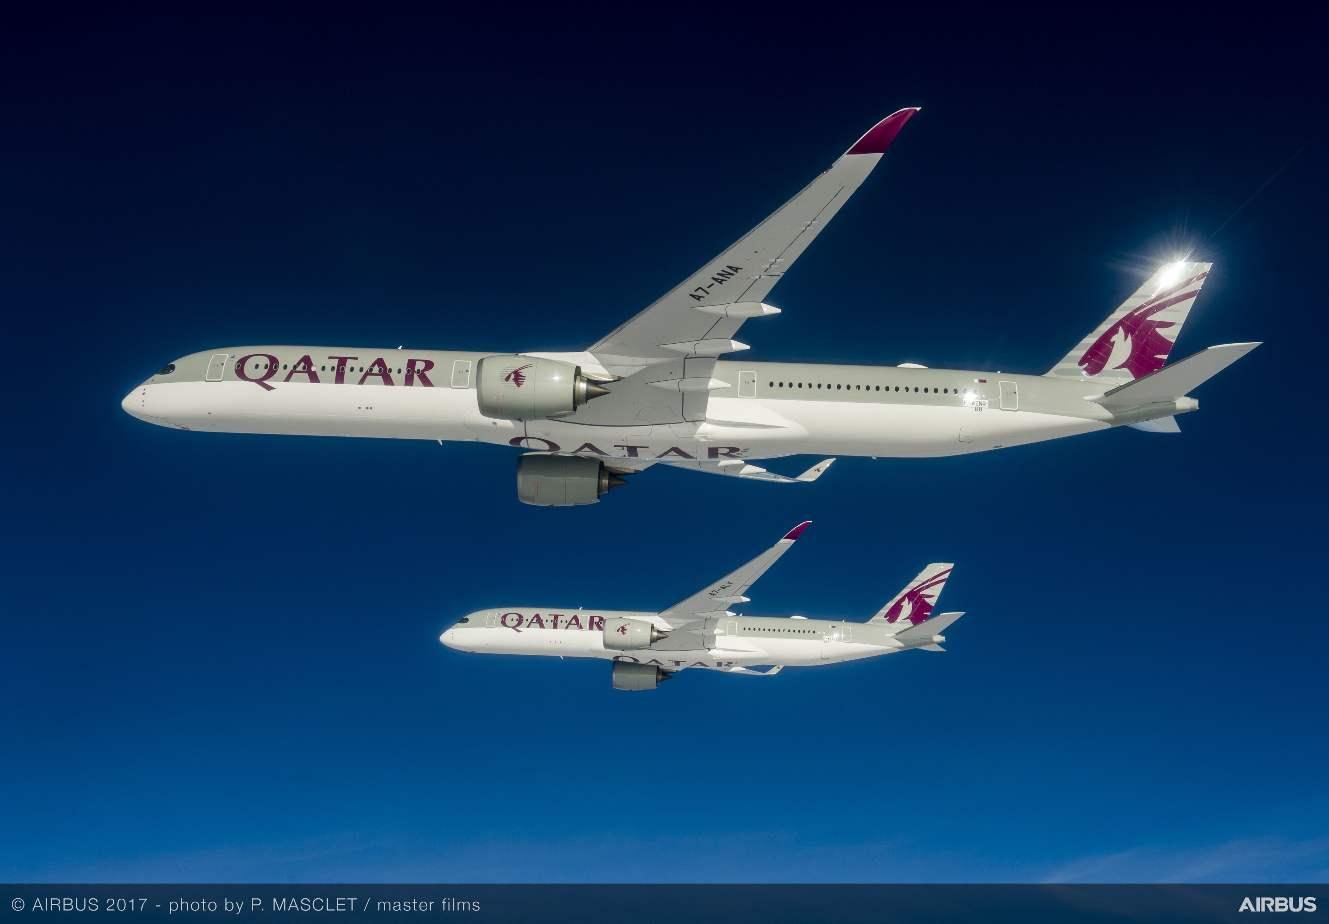 Qatar Airways first to receive Airbus A350-1000